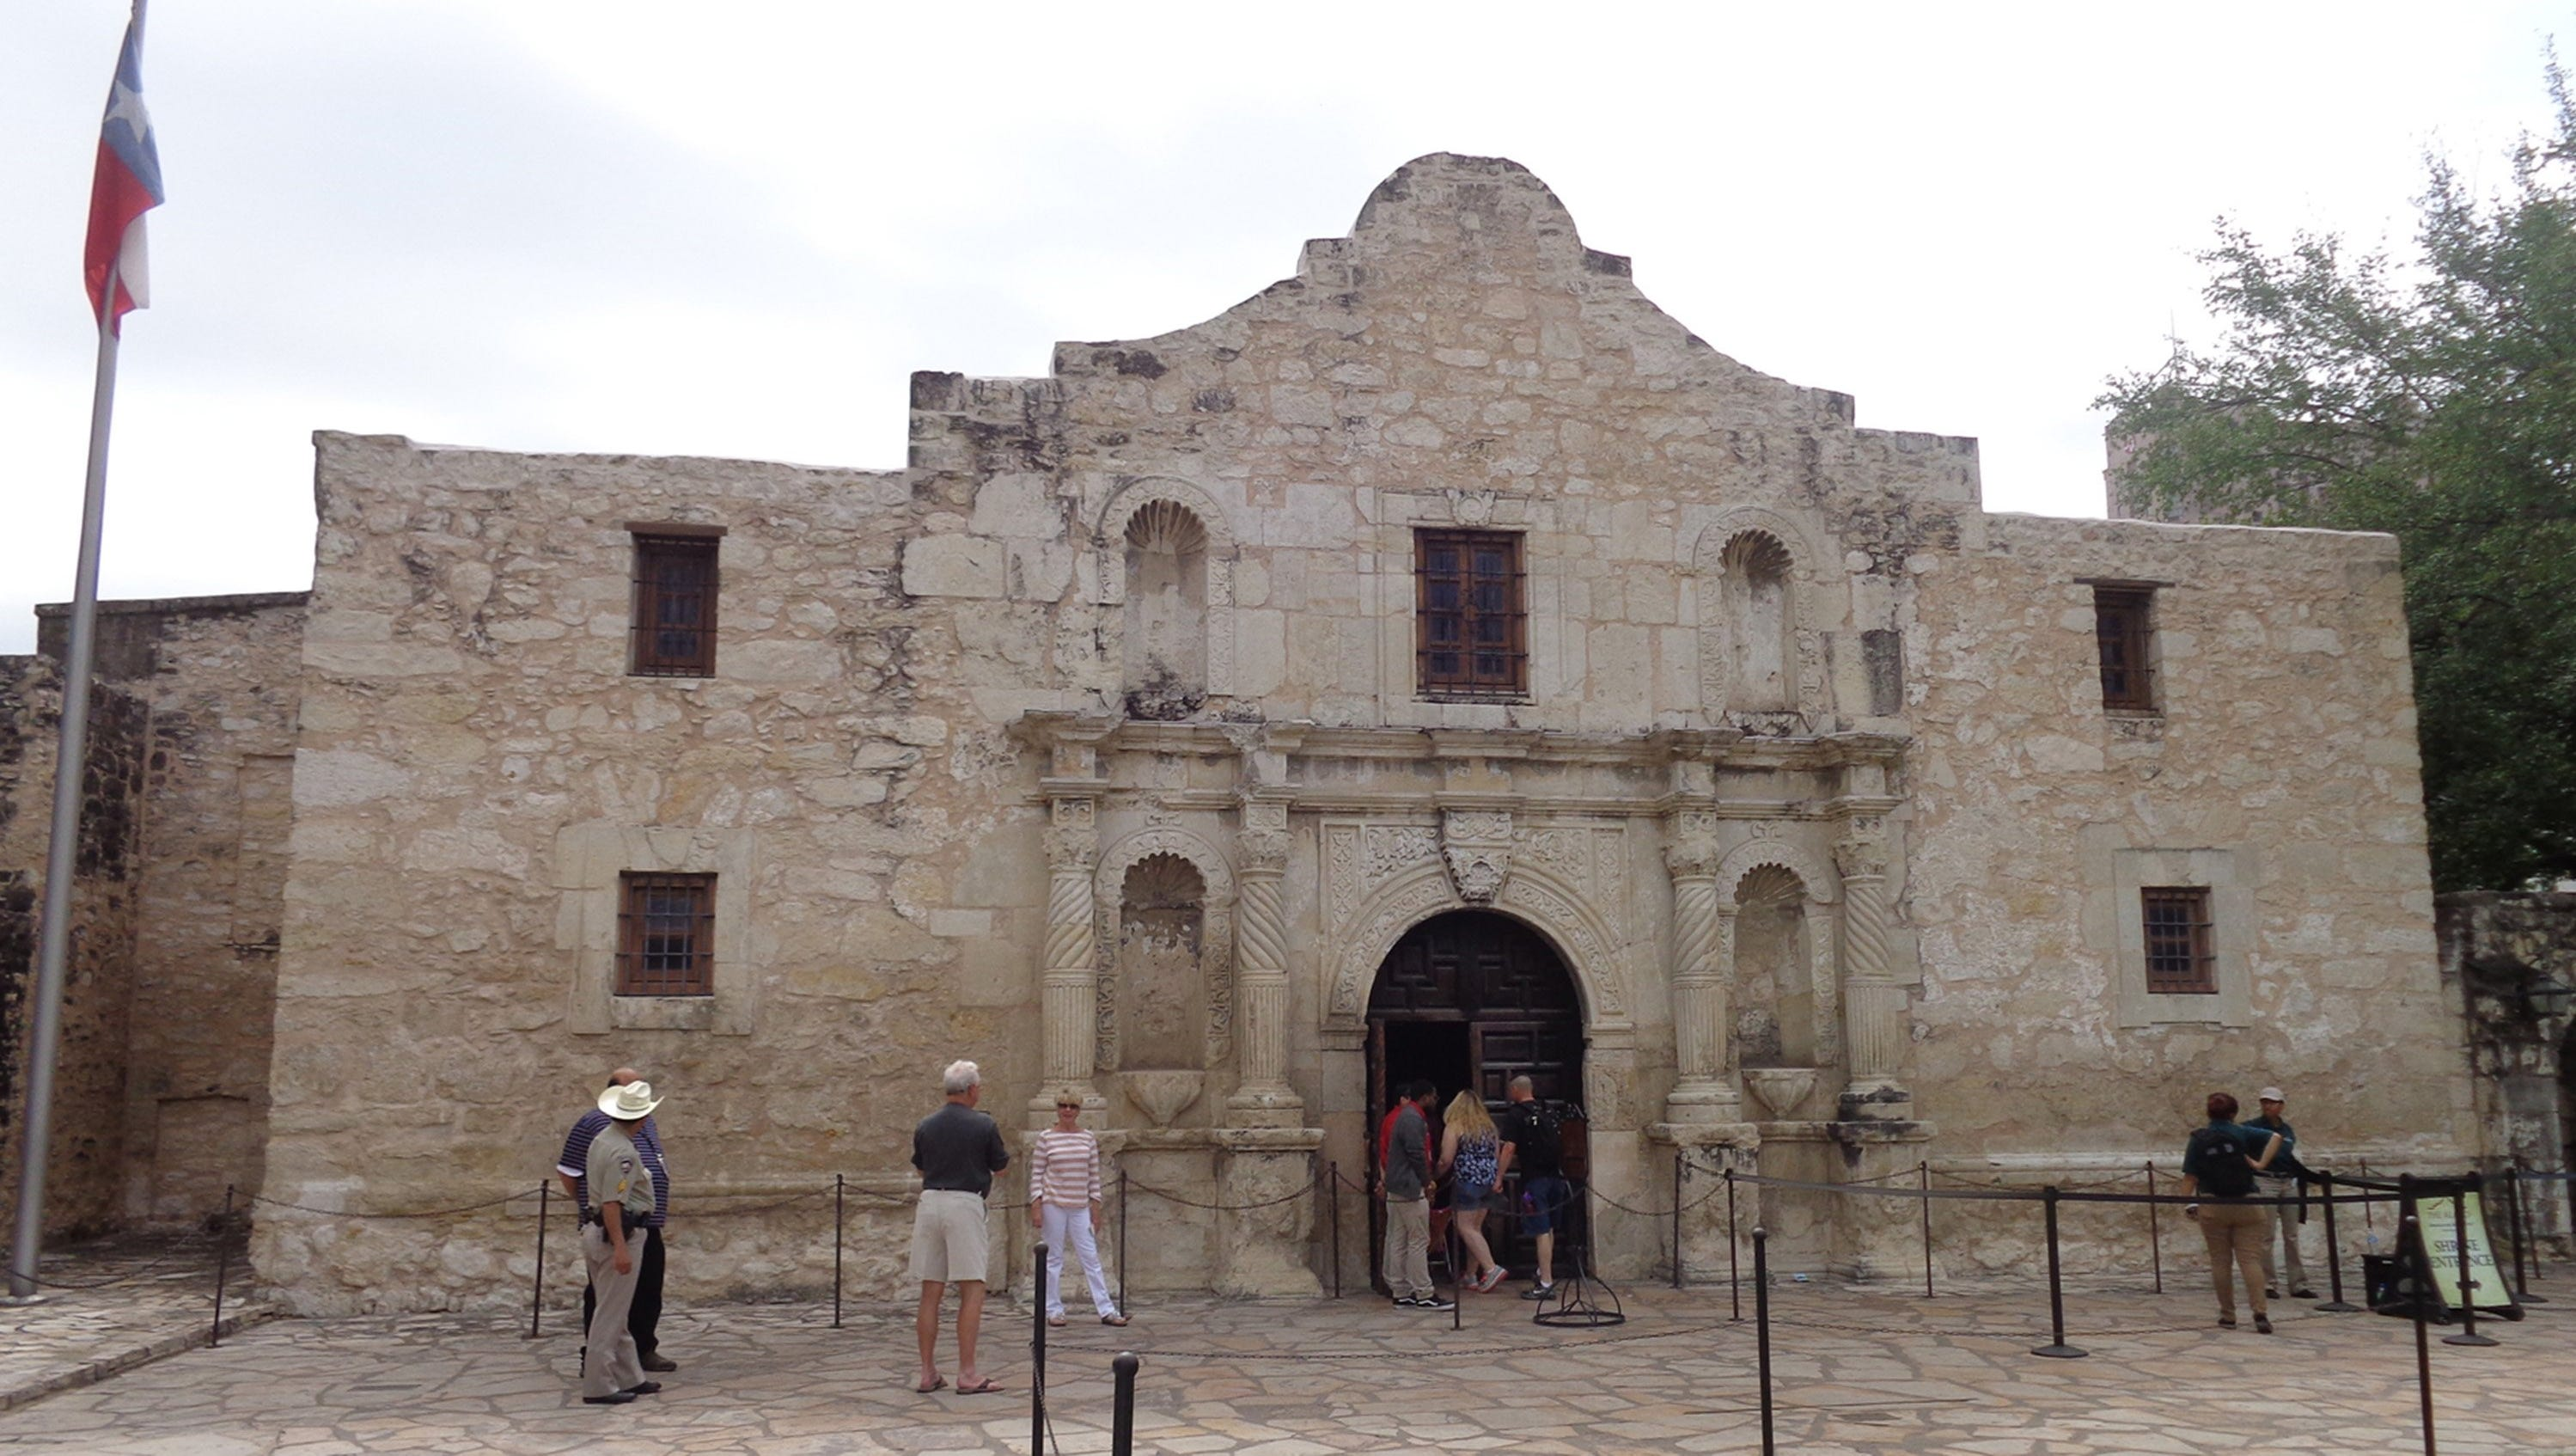 It's still worth remembering the Alamo